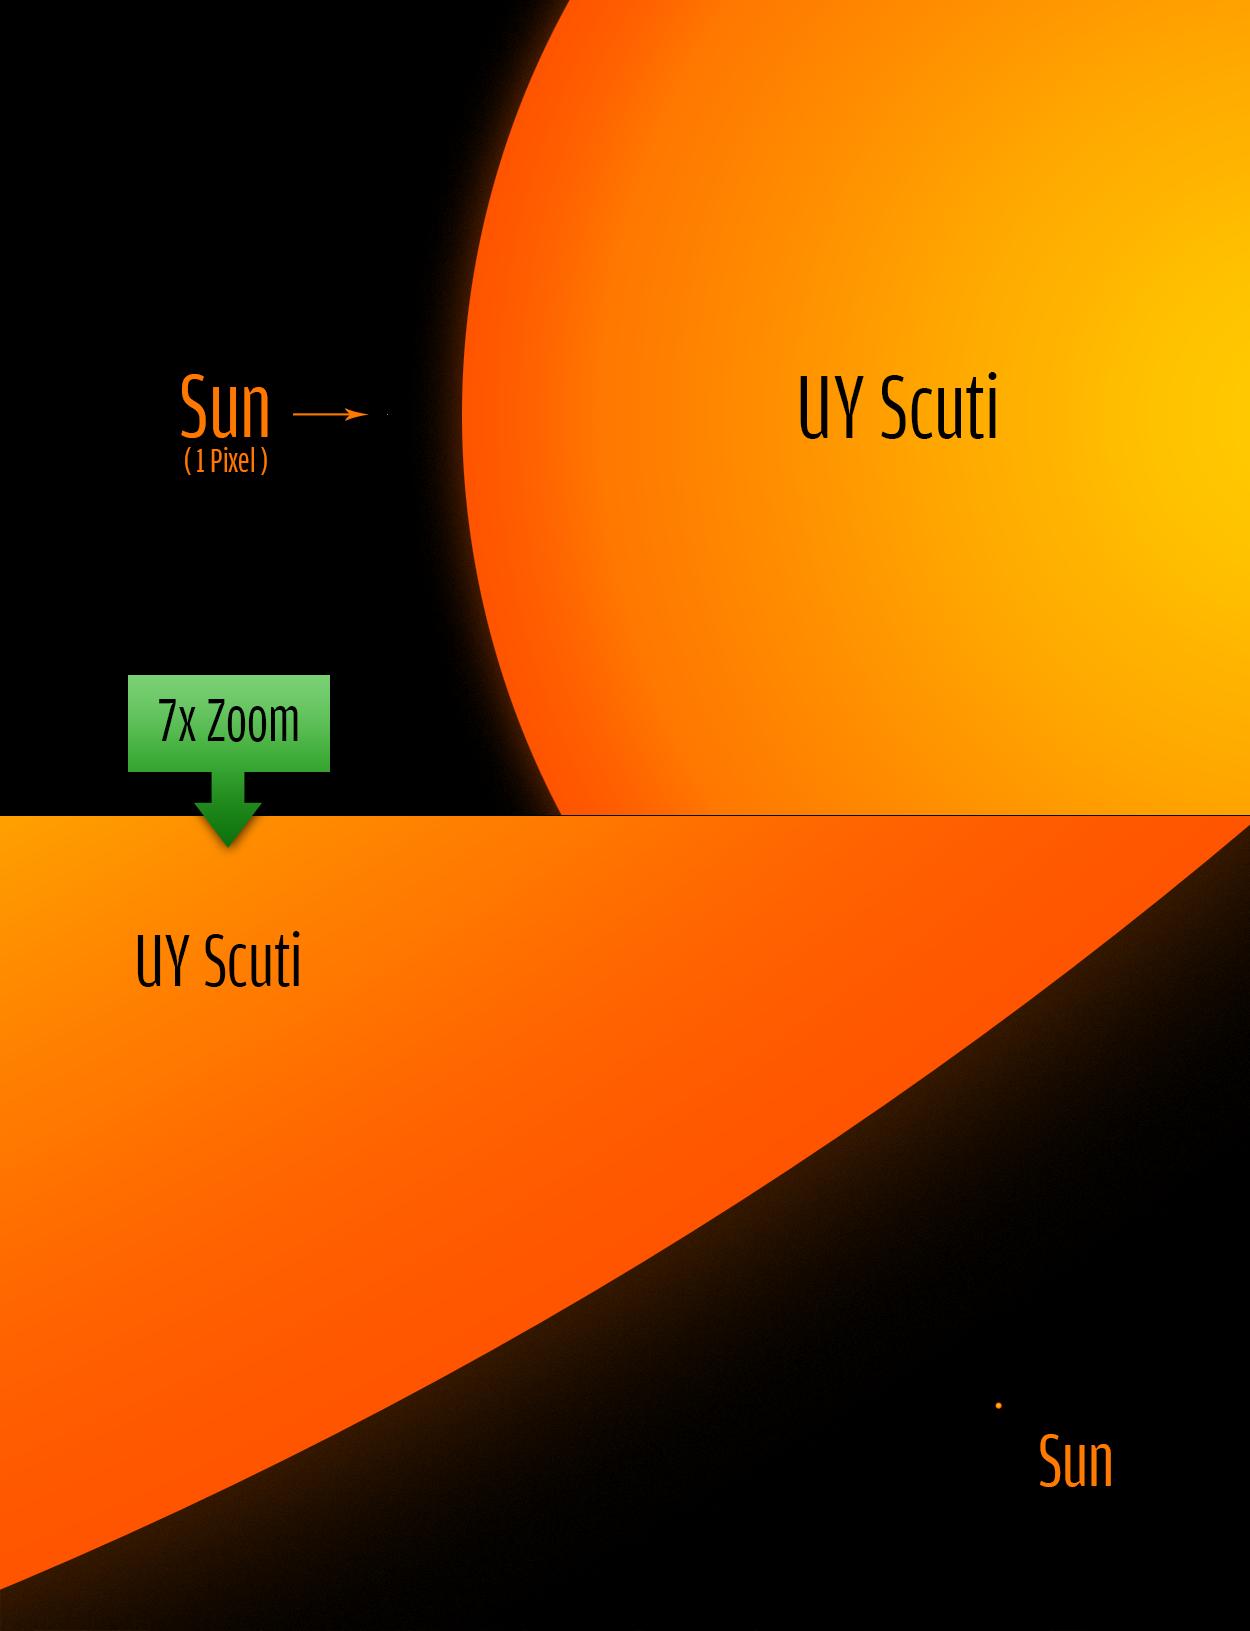 UY Scuti estrela massiva